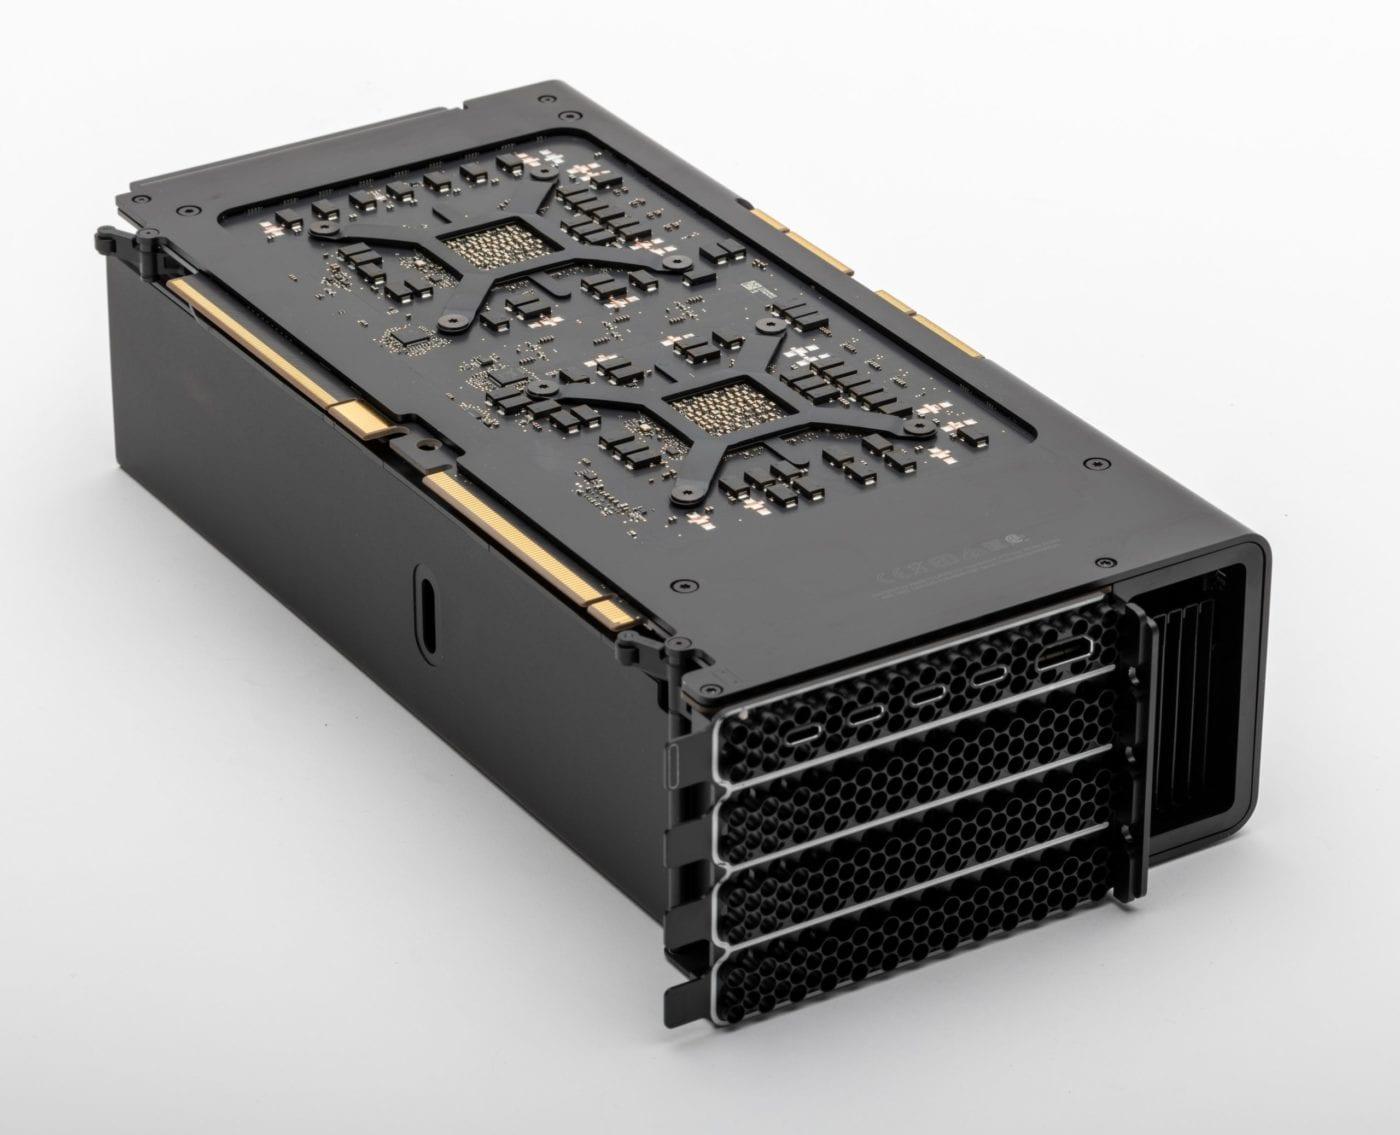 2019 Mac Pro – Radeon Pro Vega II Duo